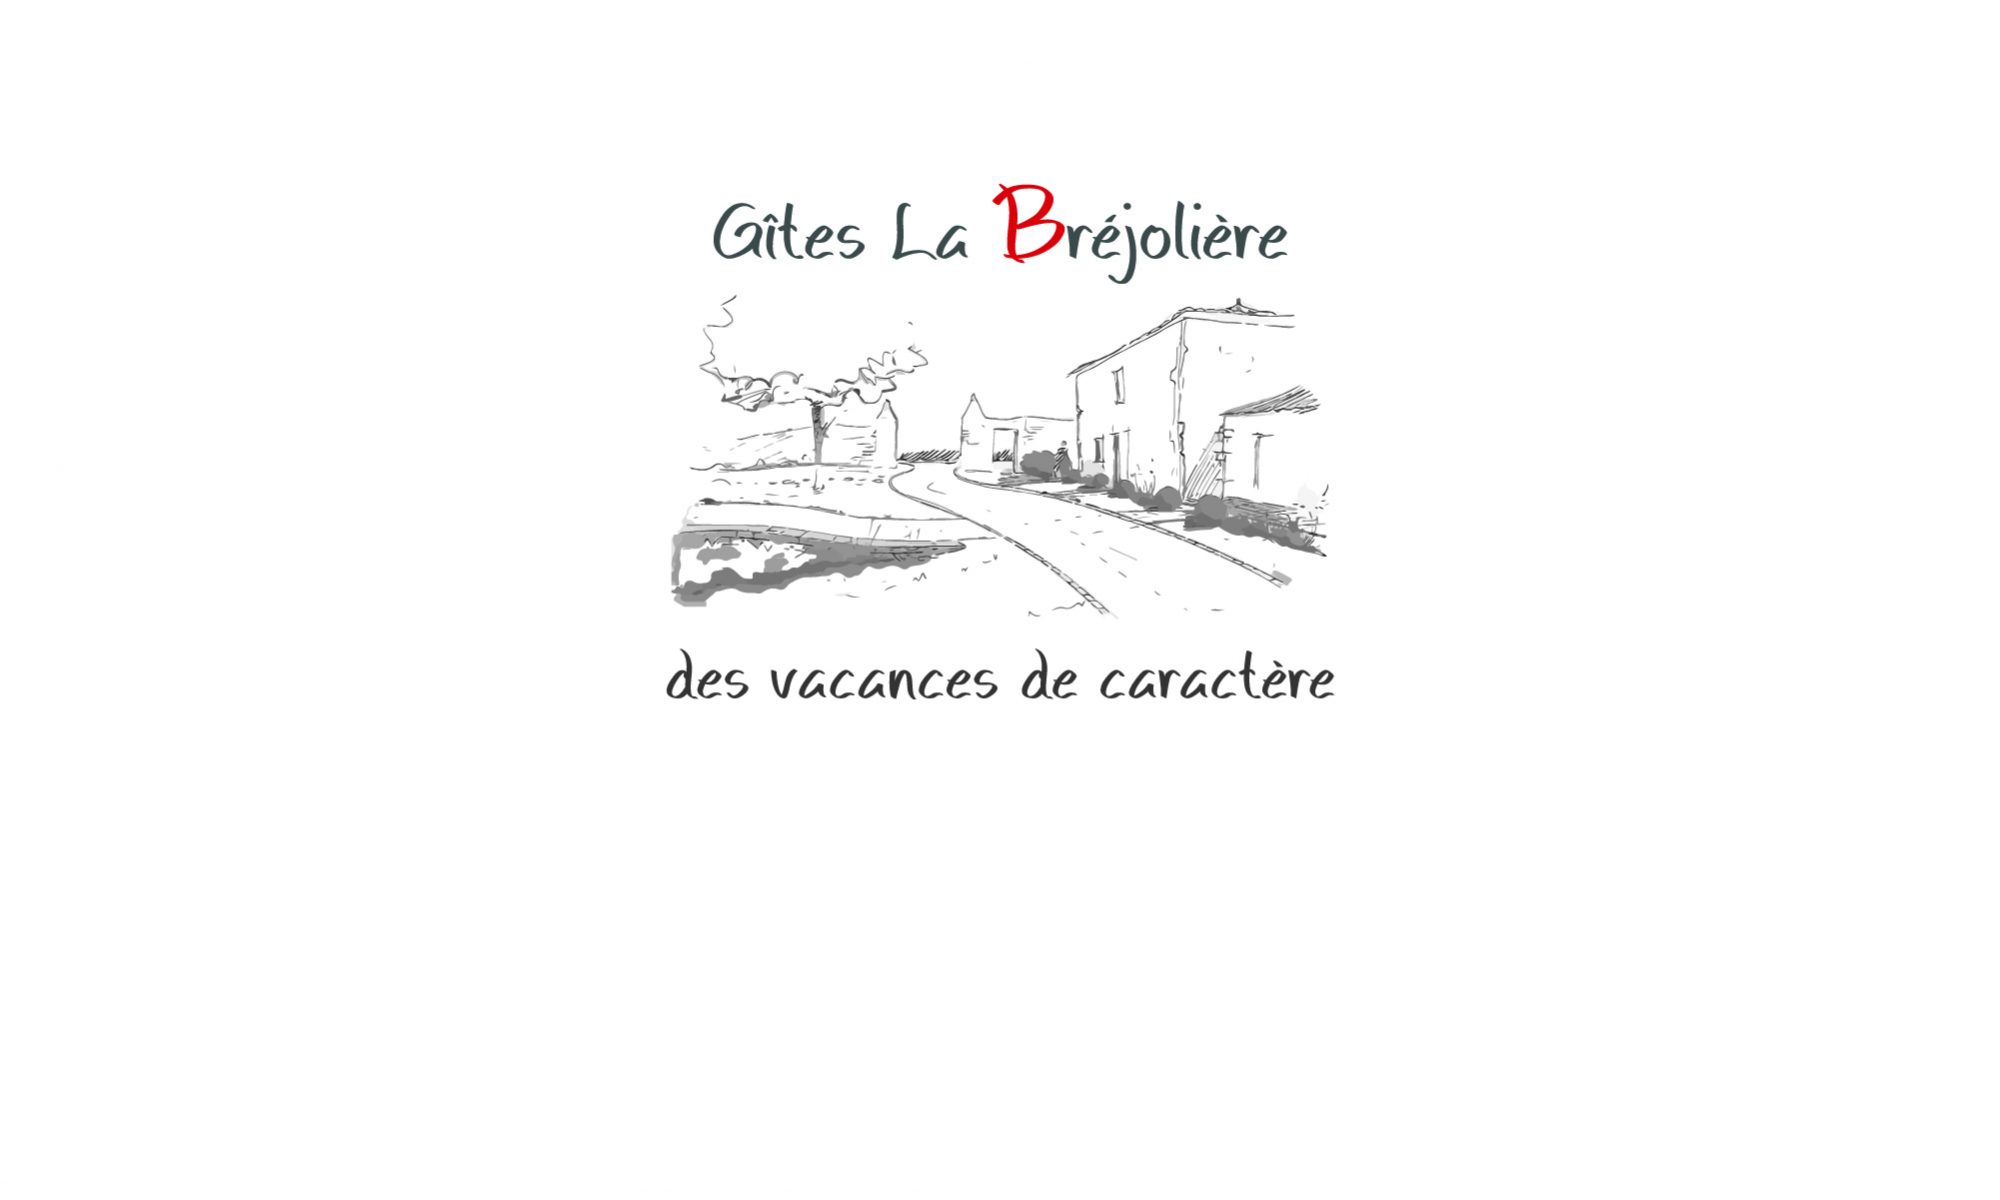 Gîtes La Bréjolière